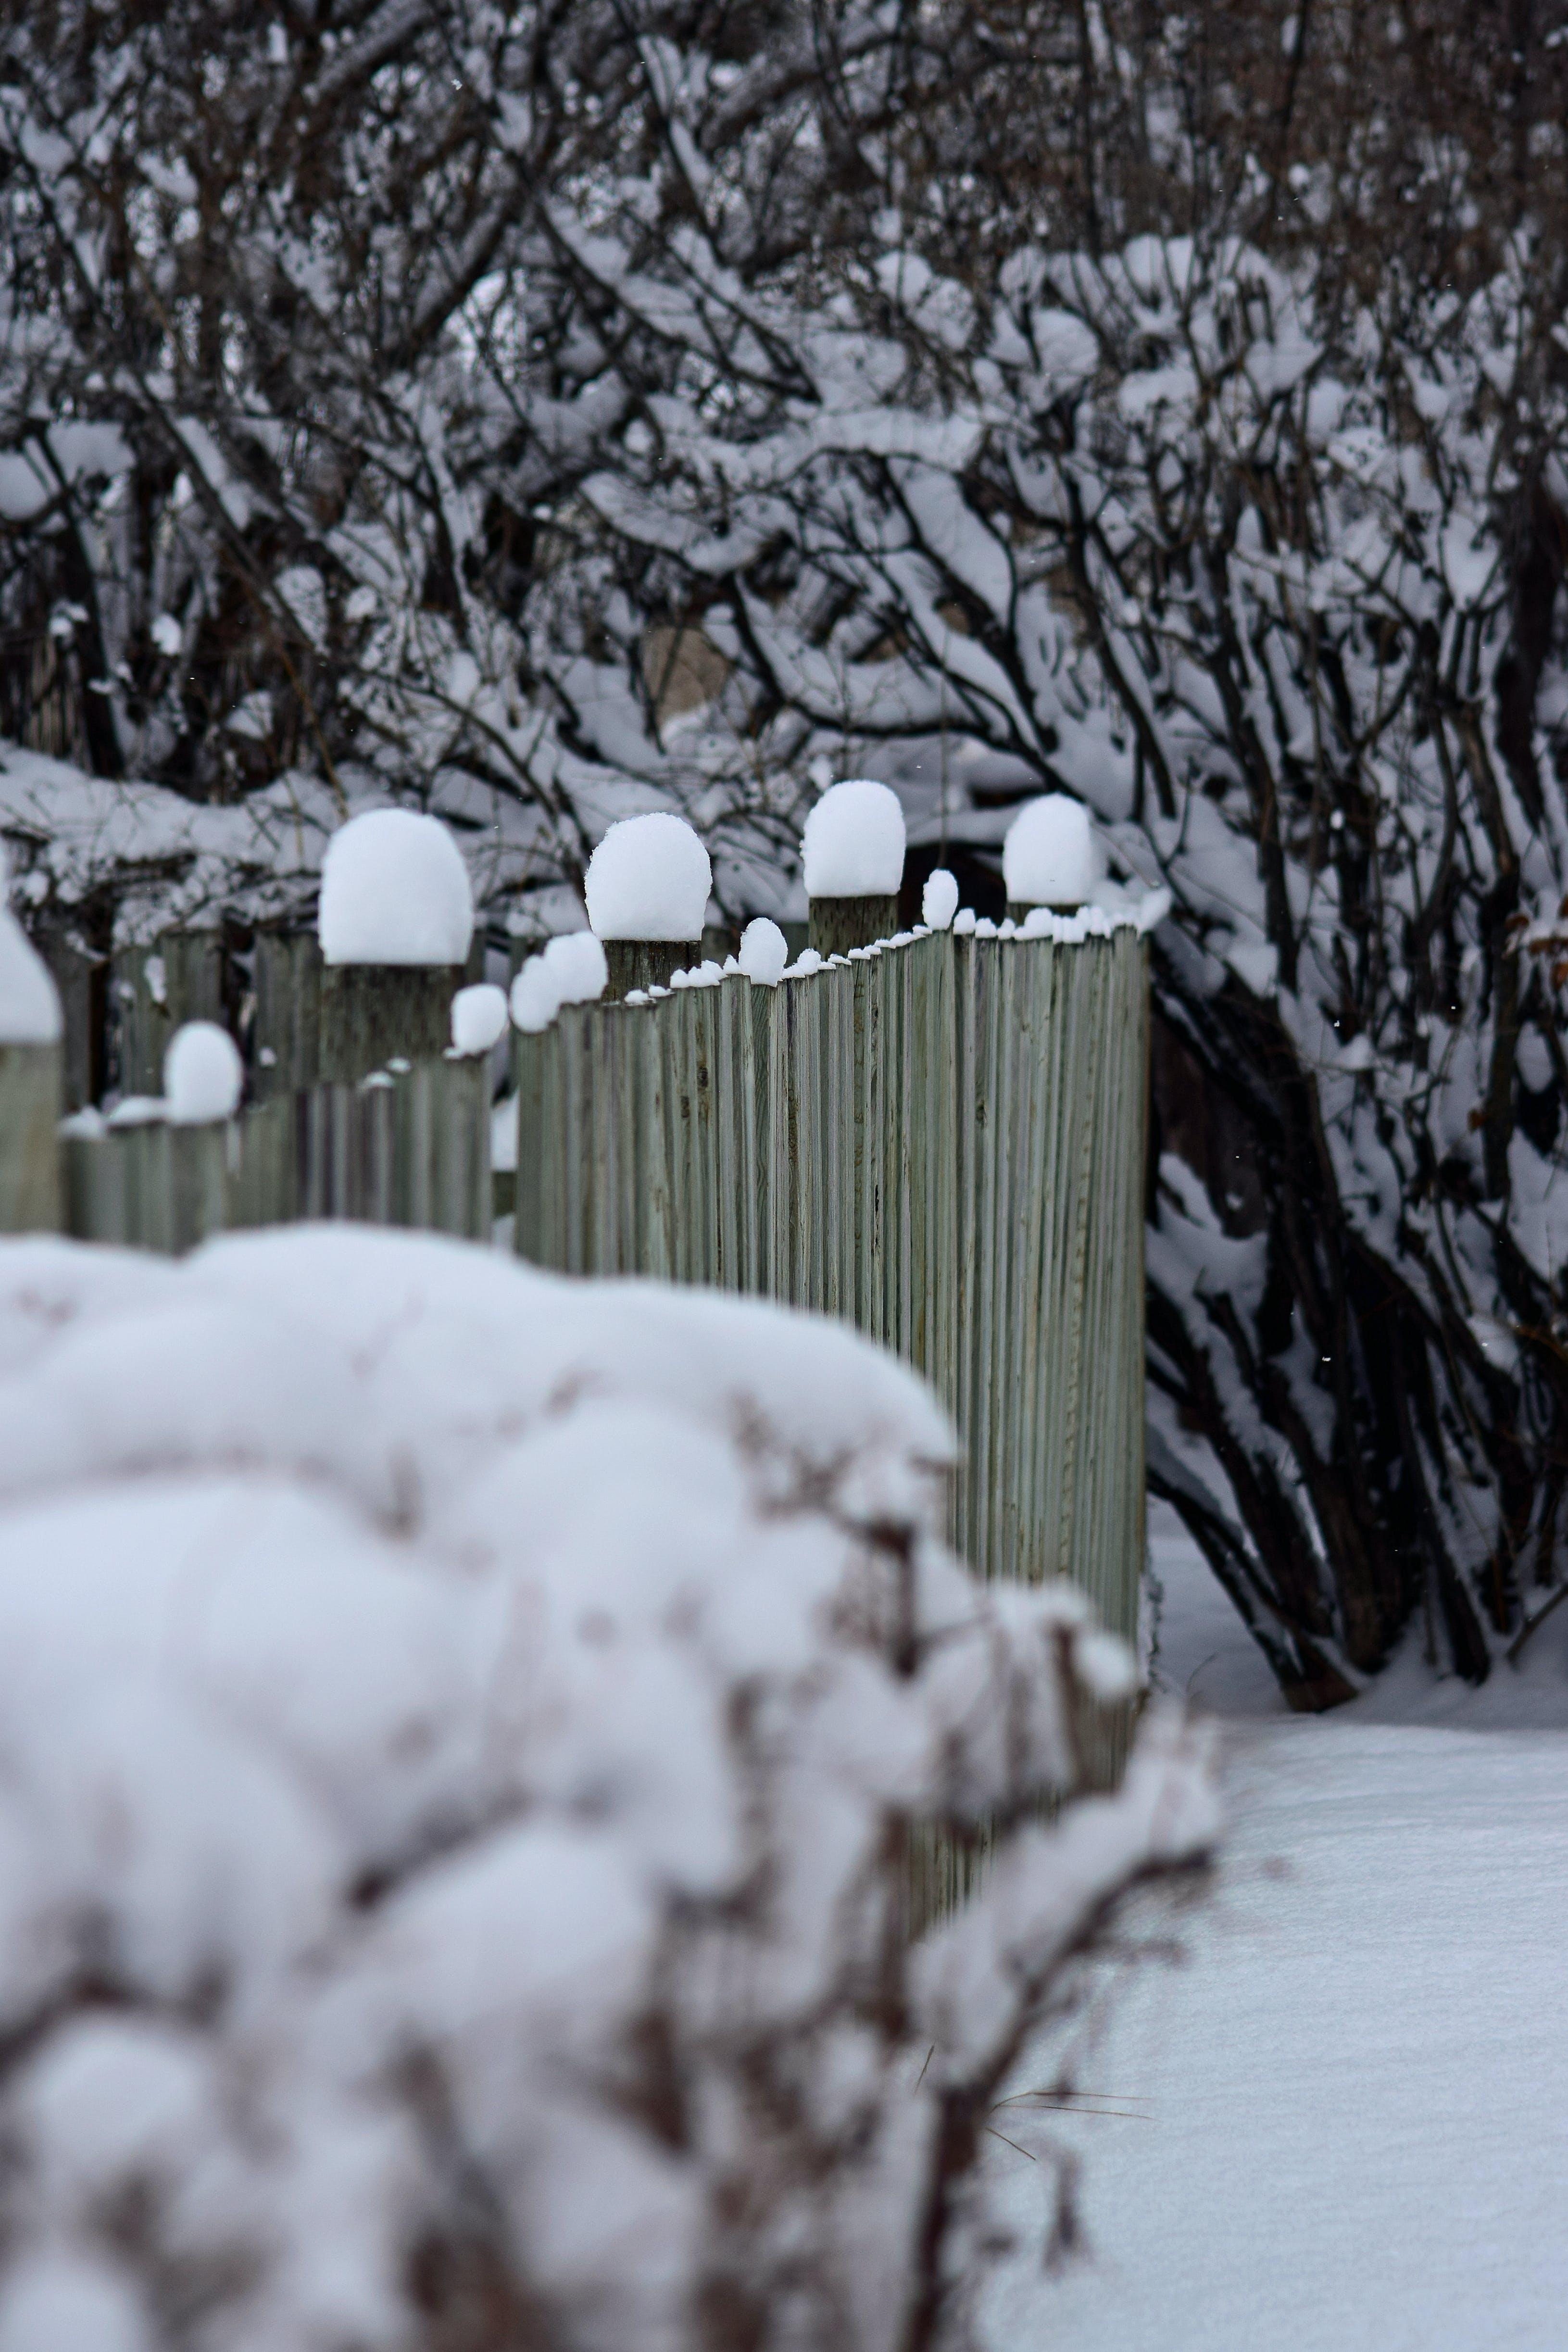 holzzaun, schnee, winter